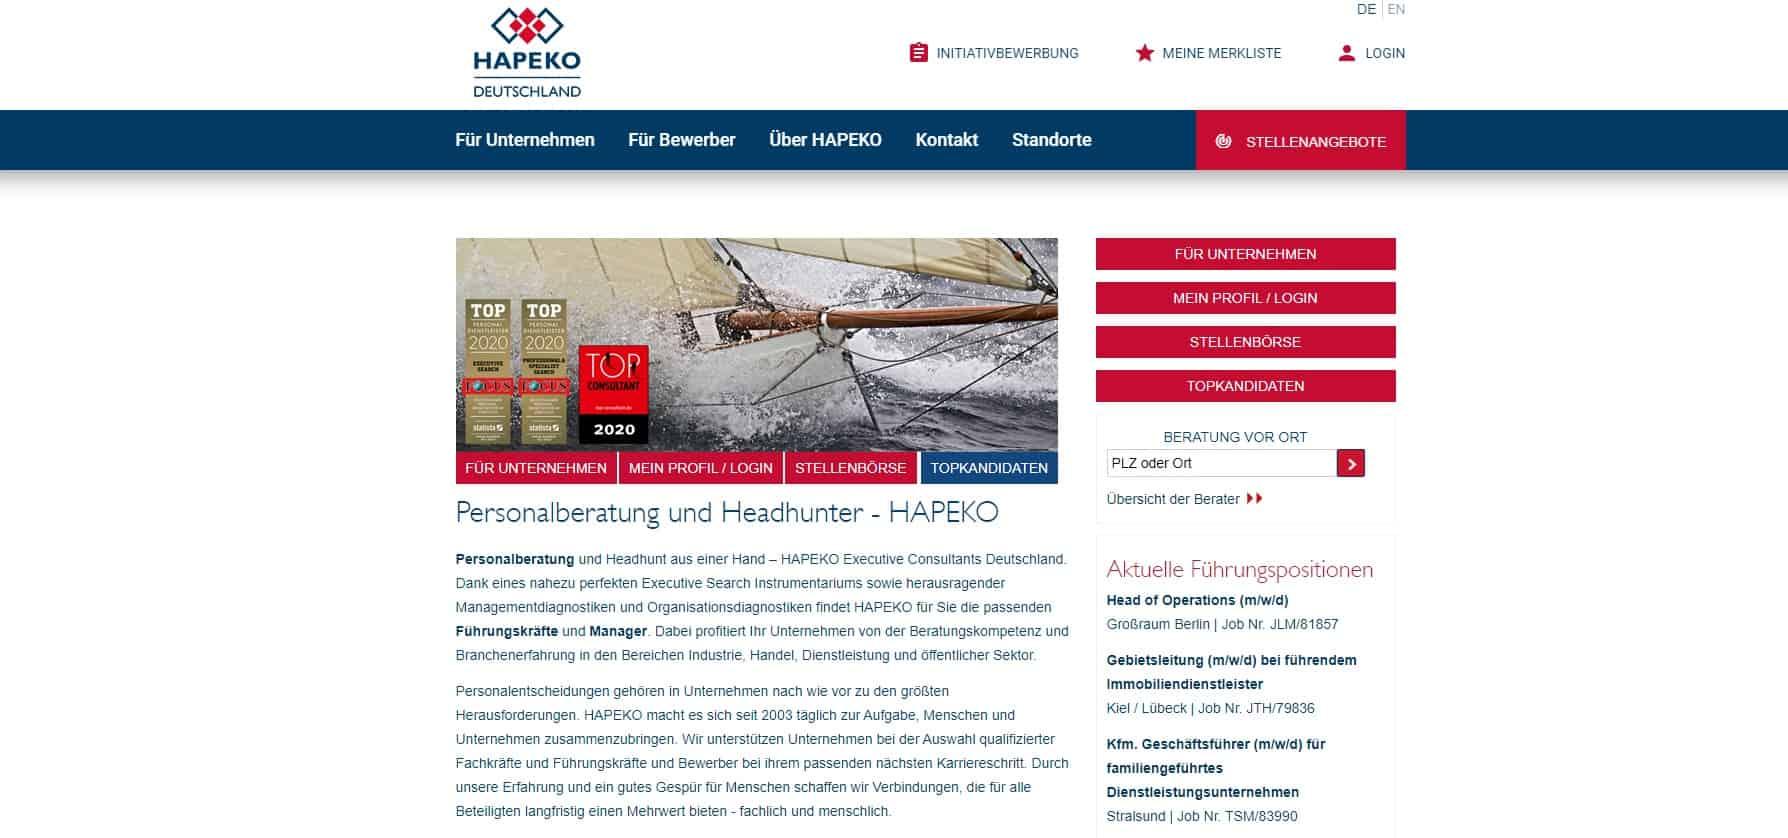 HAPEKO Deutschland GmbH